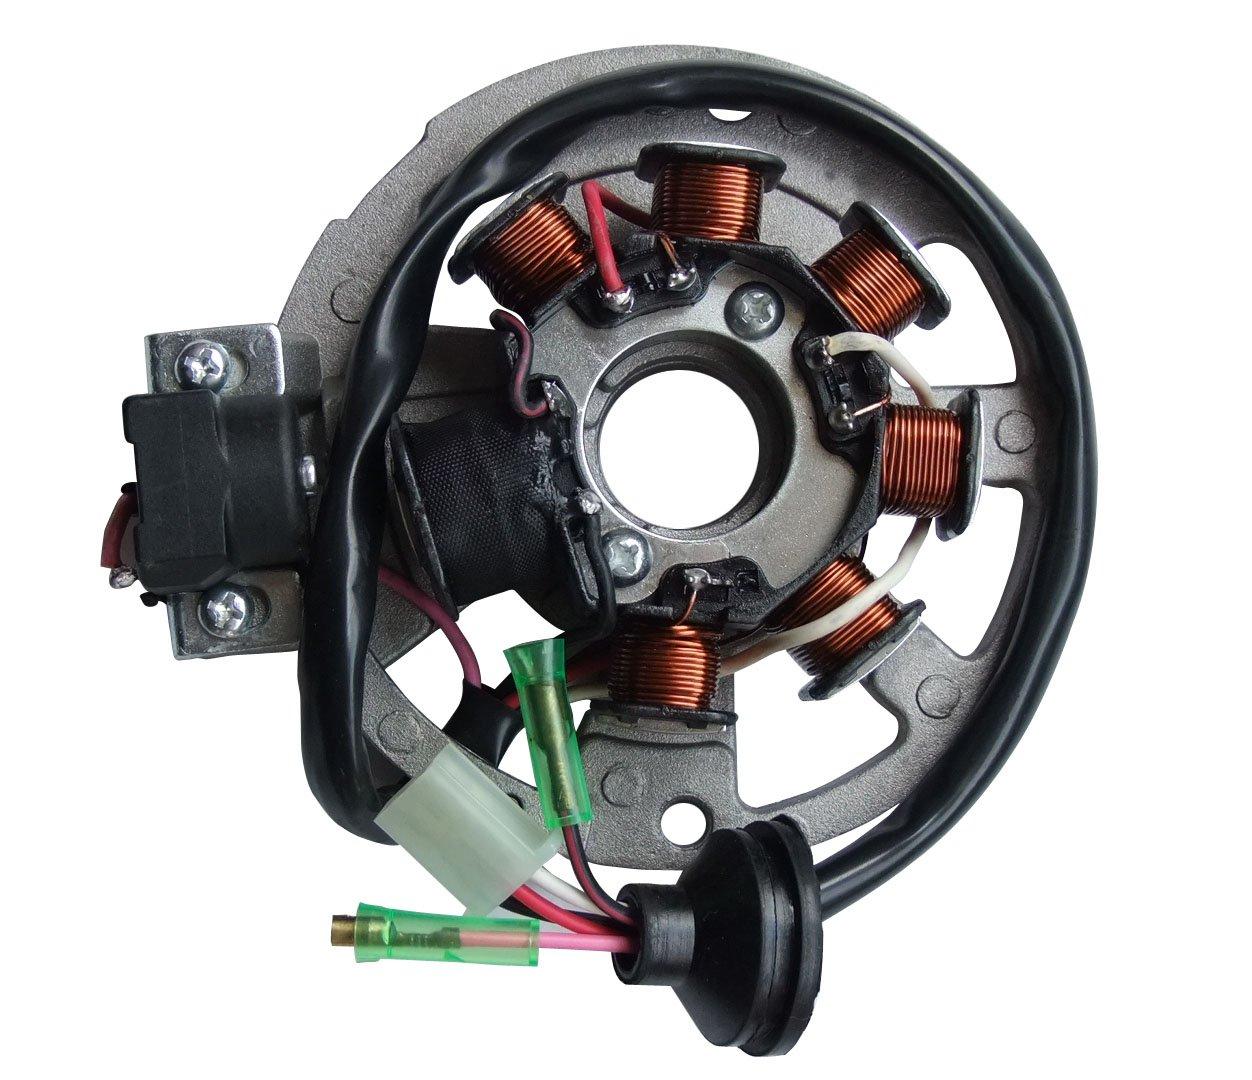 shamofeng Magneto Stator Polaris ATV Scrambler 90 2001-2003 Sportsman 90 2001-2006 Predator 90 2003-2006 Replaces Polaris 0450523, 0451000